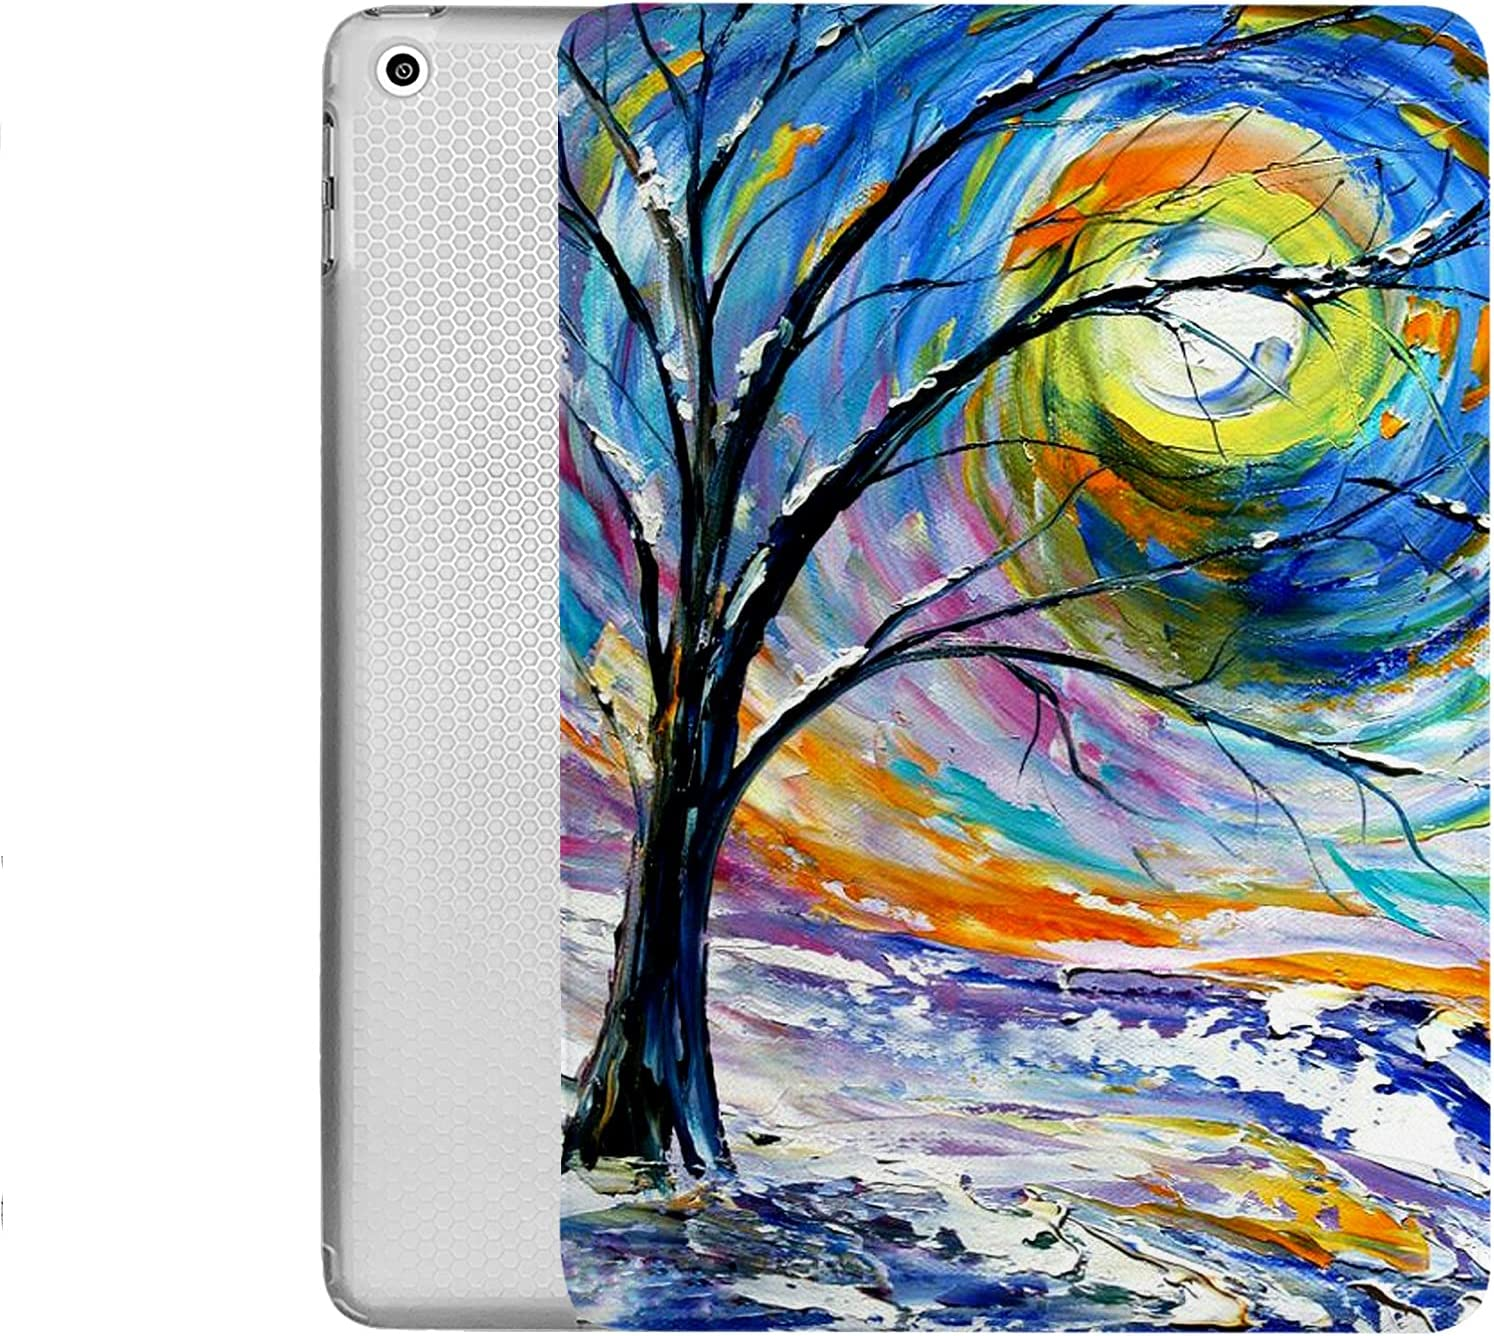 DuraSafe Cases for iPad Genuine Mini 3 2 Max 71% OFF 2013 7.9 2014 2012 1